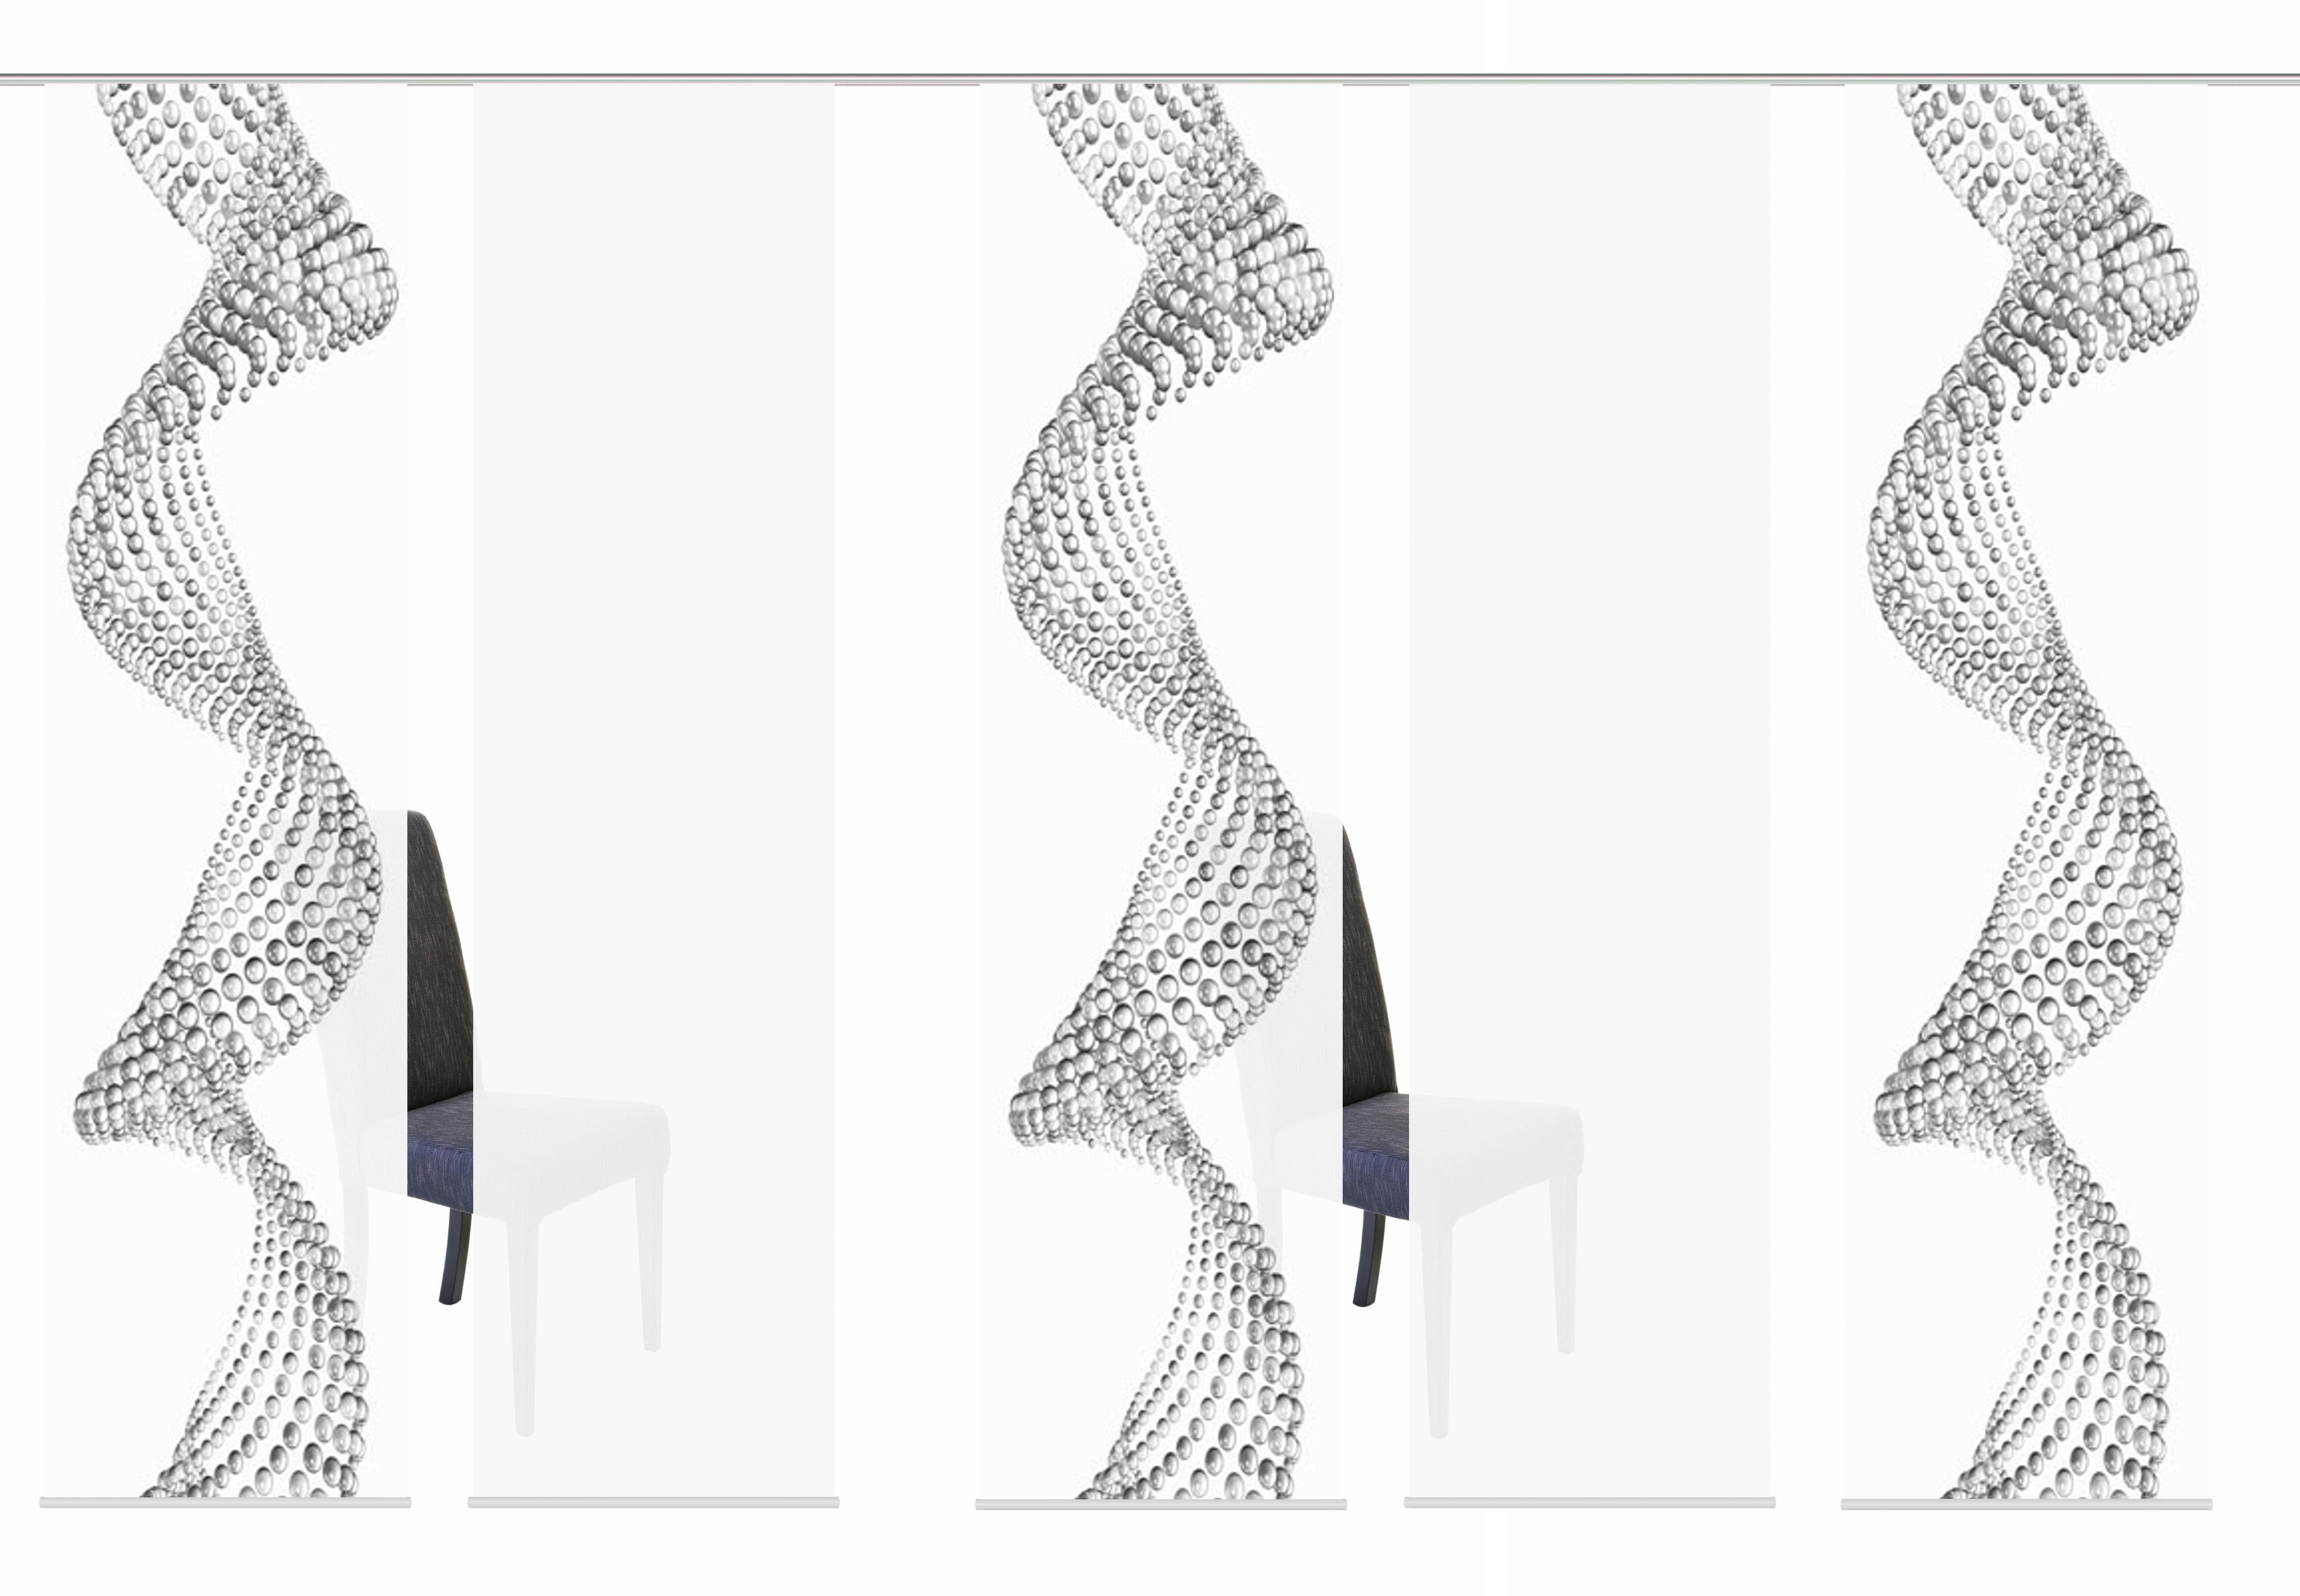 Schiebegardine »5ER SET PEARL«, HOME WOHNIDEEN, Paneelwagen (5 Stück), Schiebevorhang 5er Set Digitaldruck